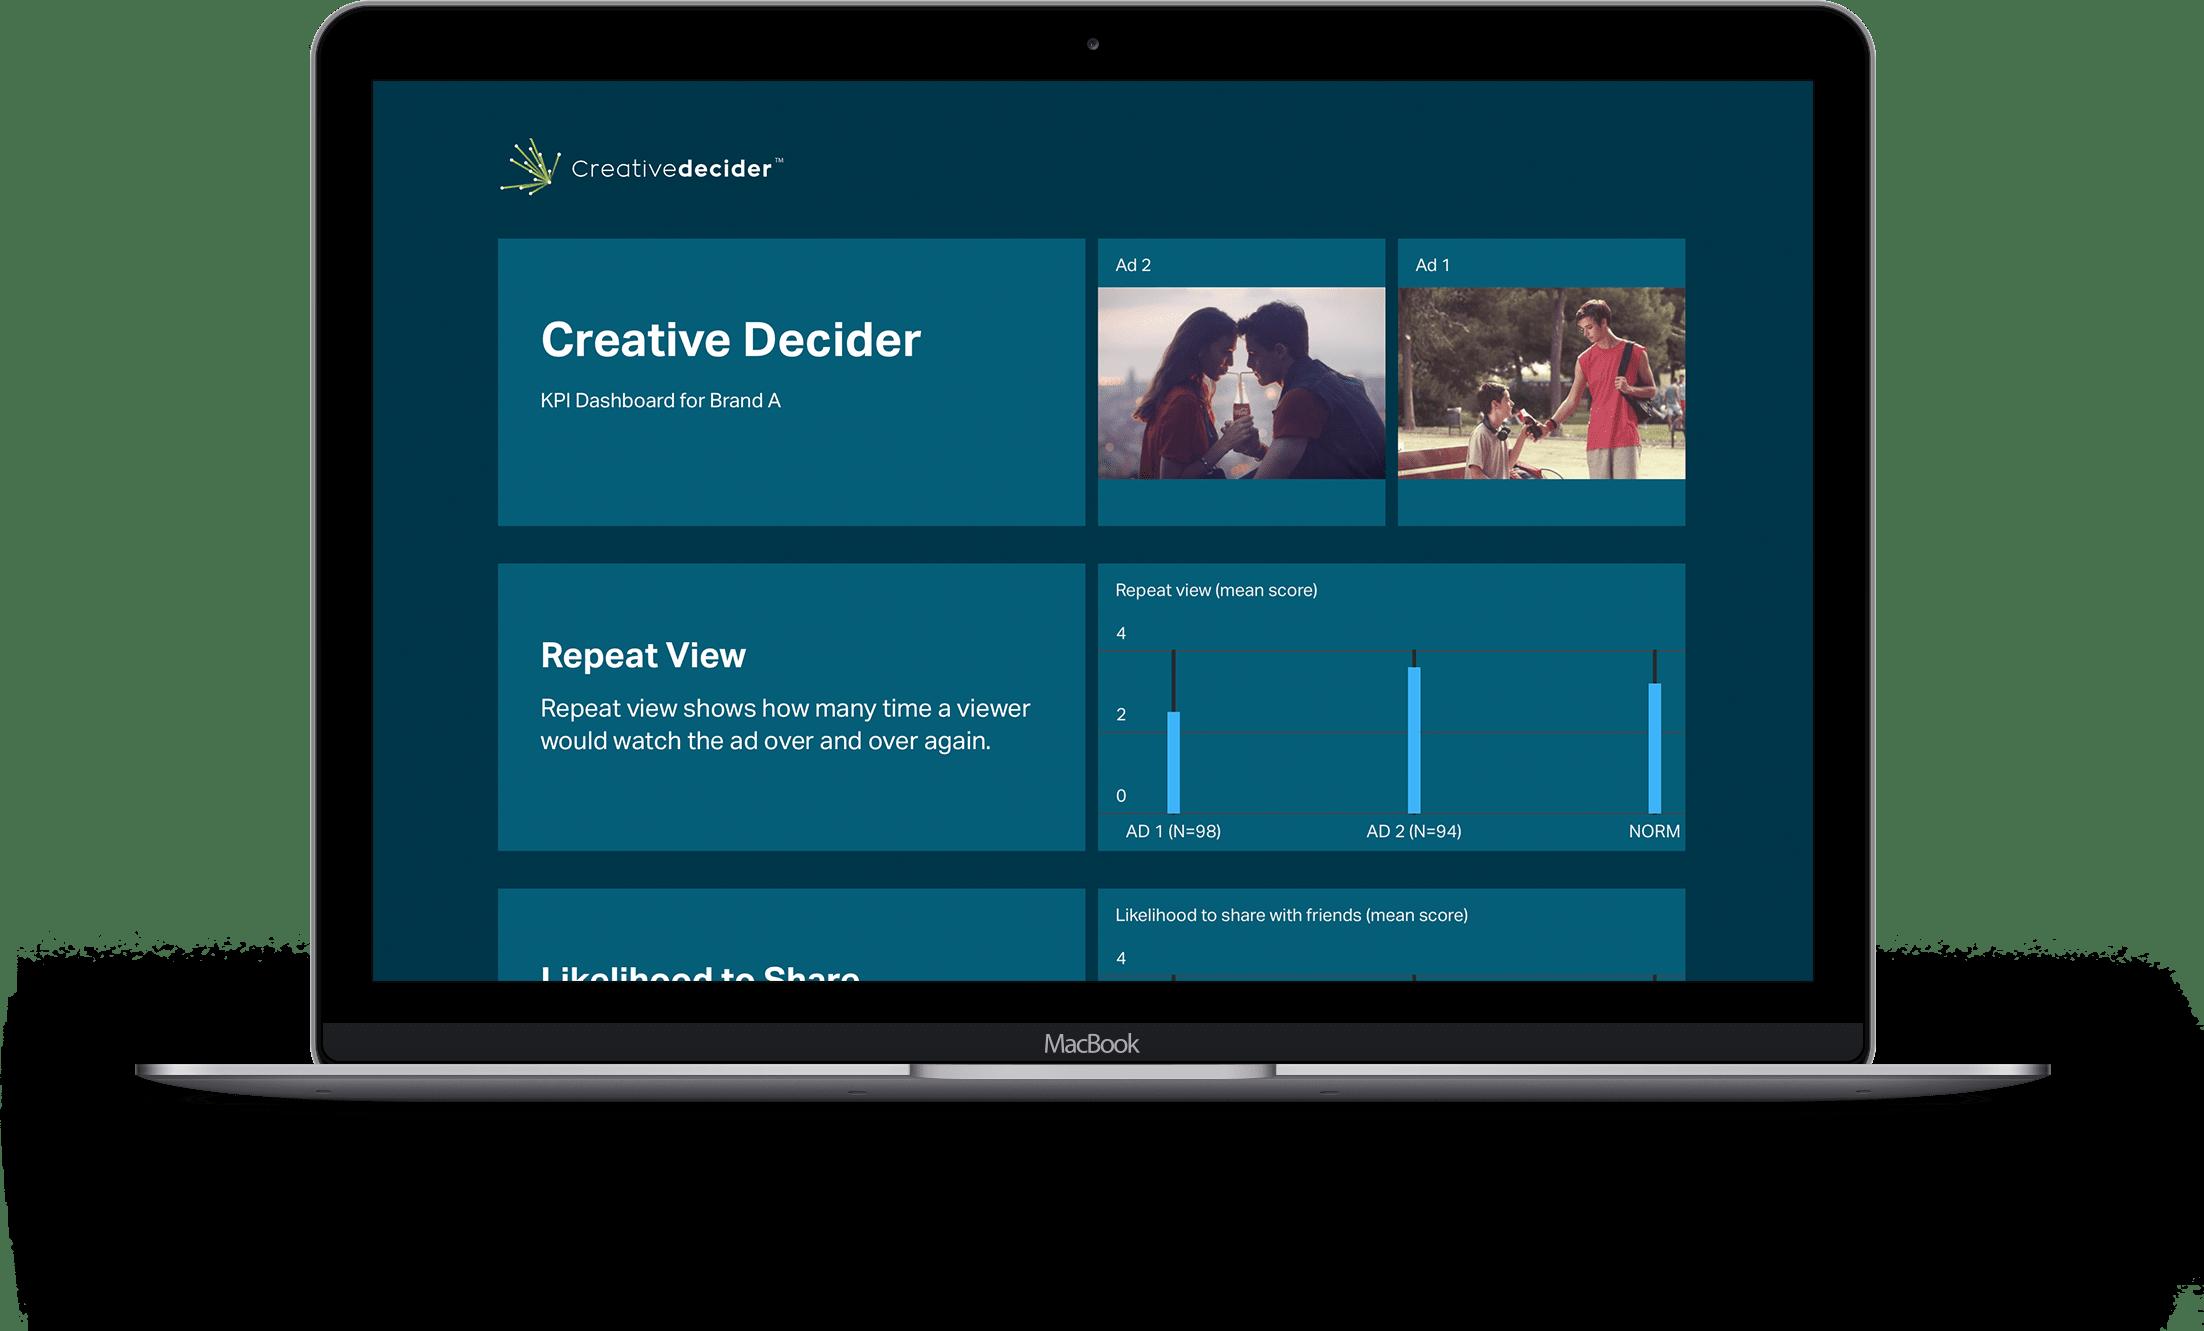 creative-decider-mockup__laptop-min.png